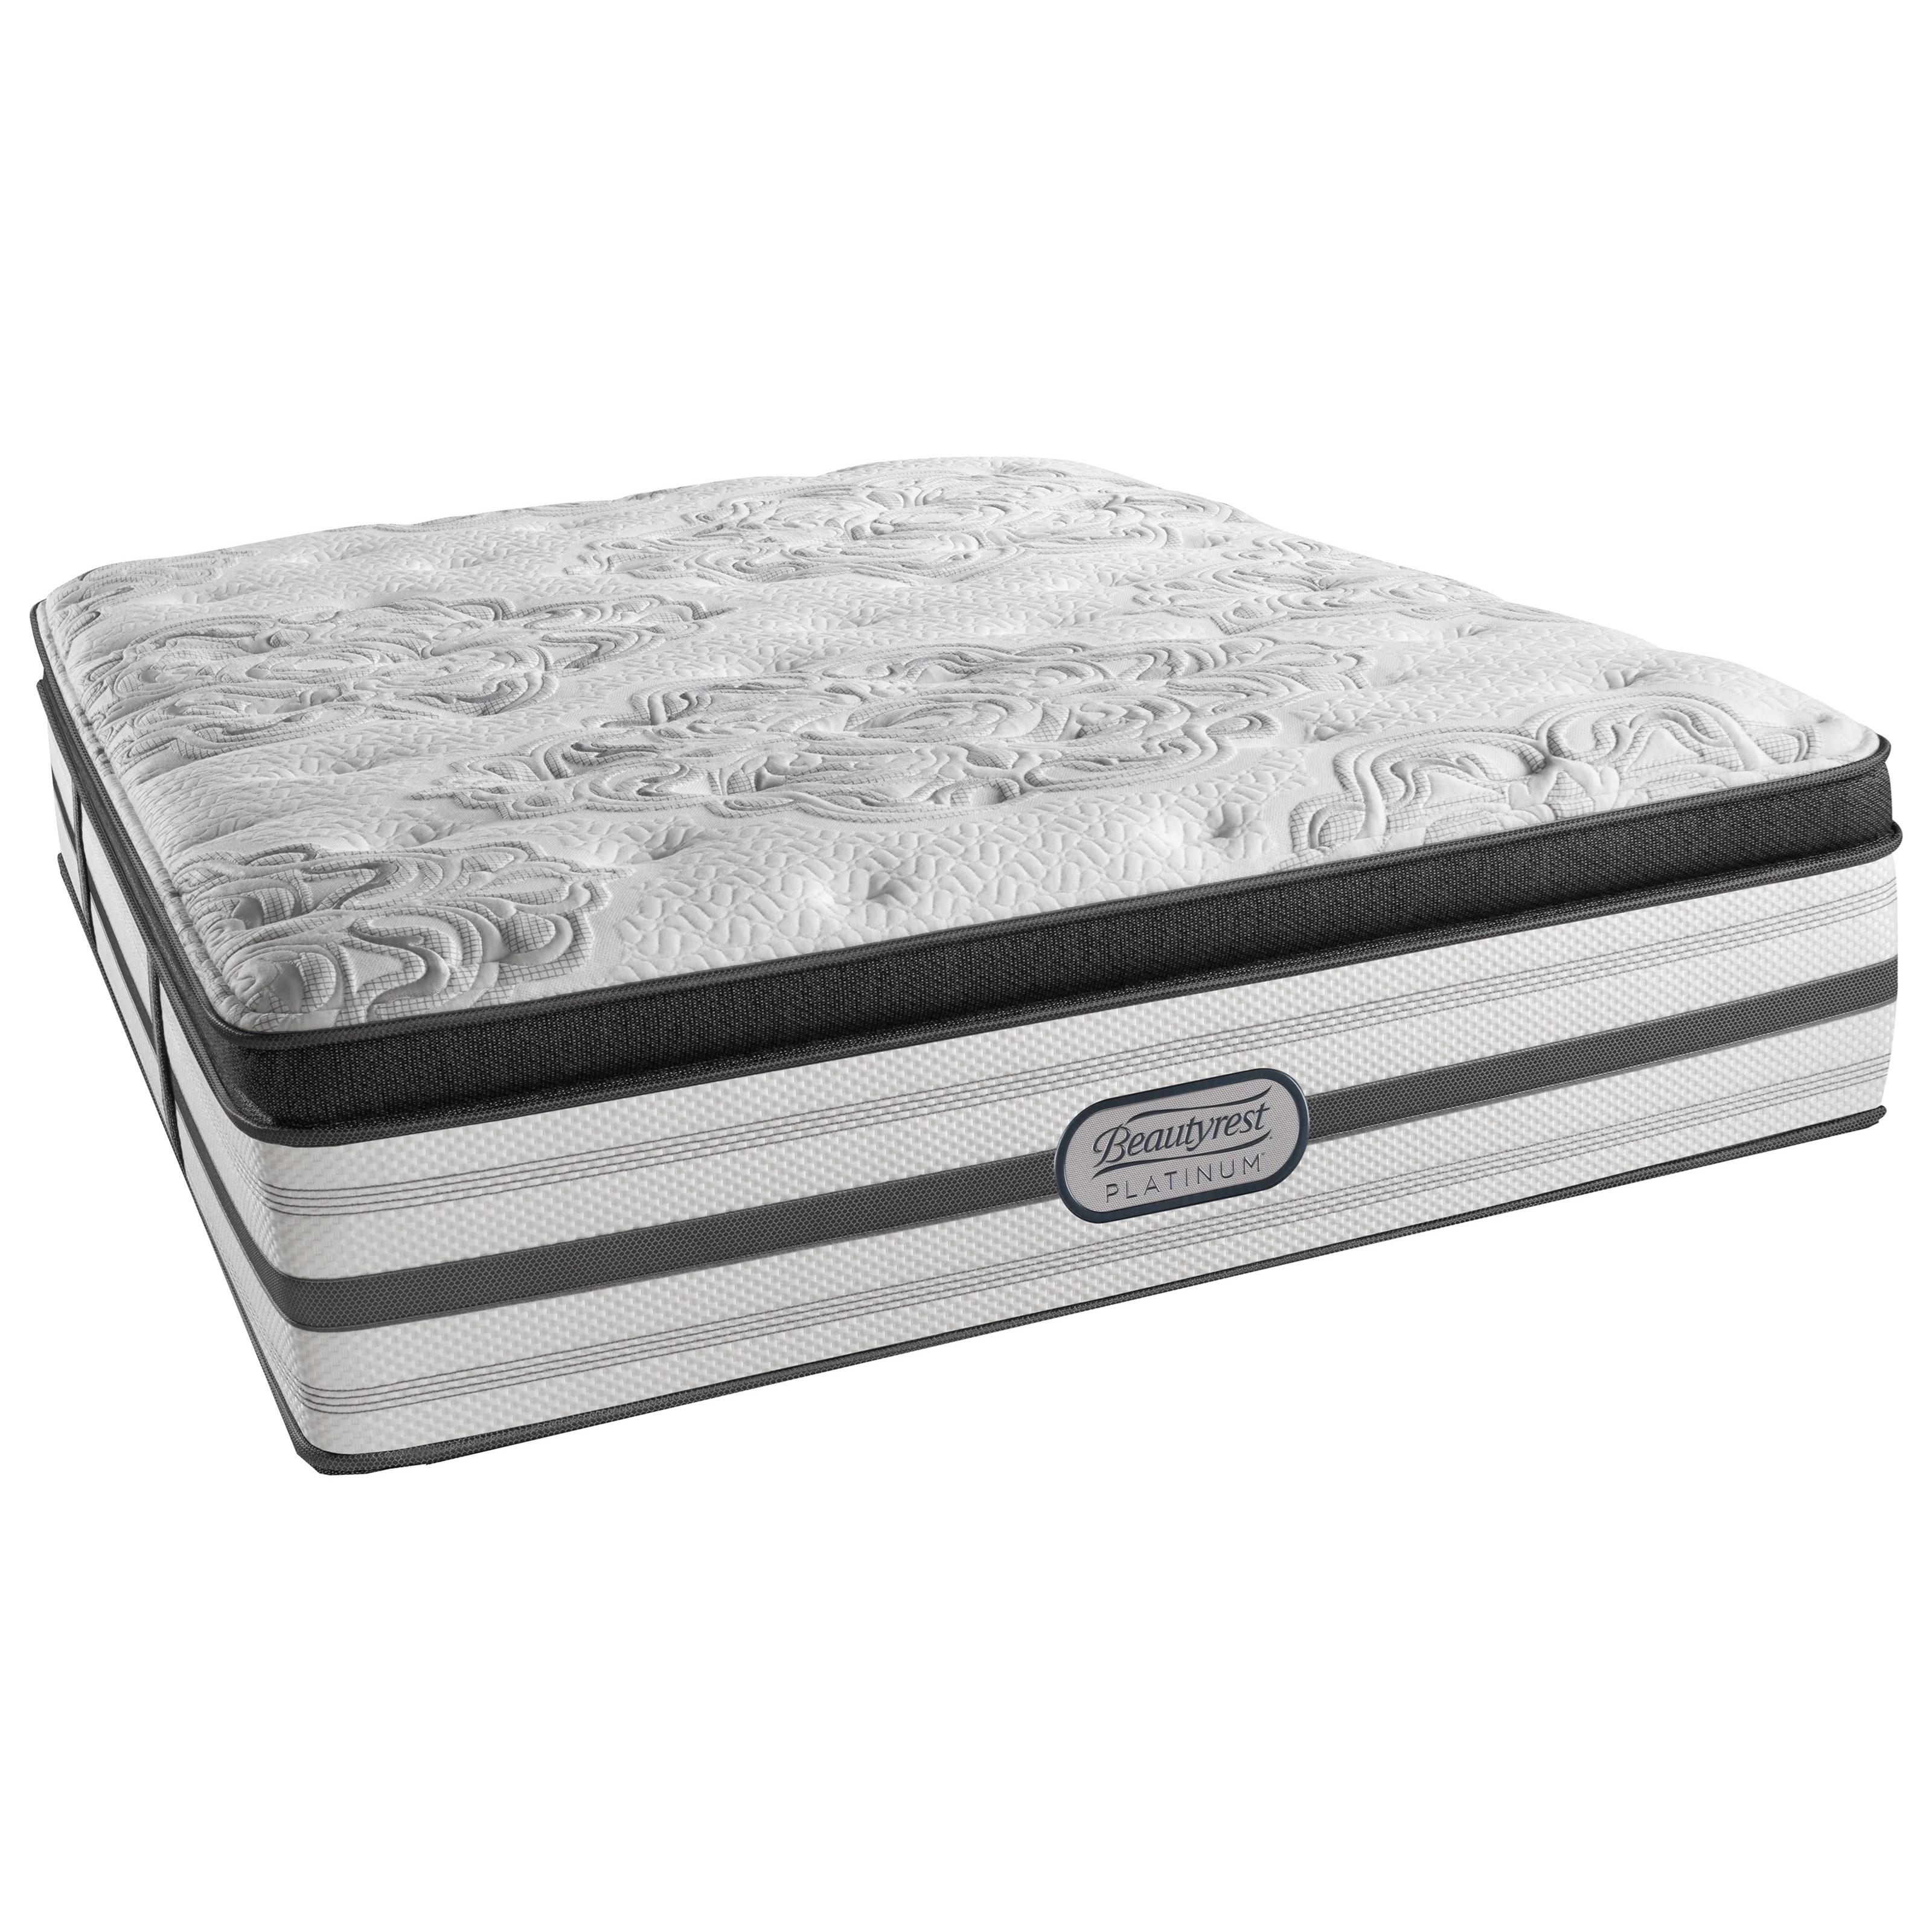 Beautyrest Platinum Katherine Queen Plush Box Top Adjustable Set - Item Number: LV4PLBT-Q+SM1-Q